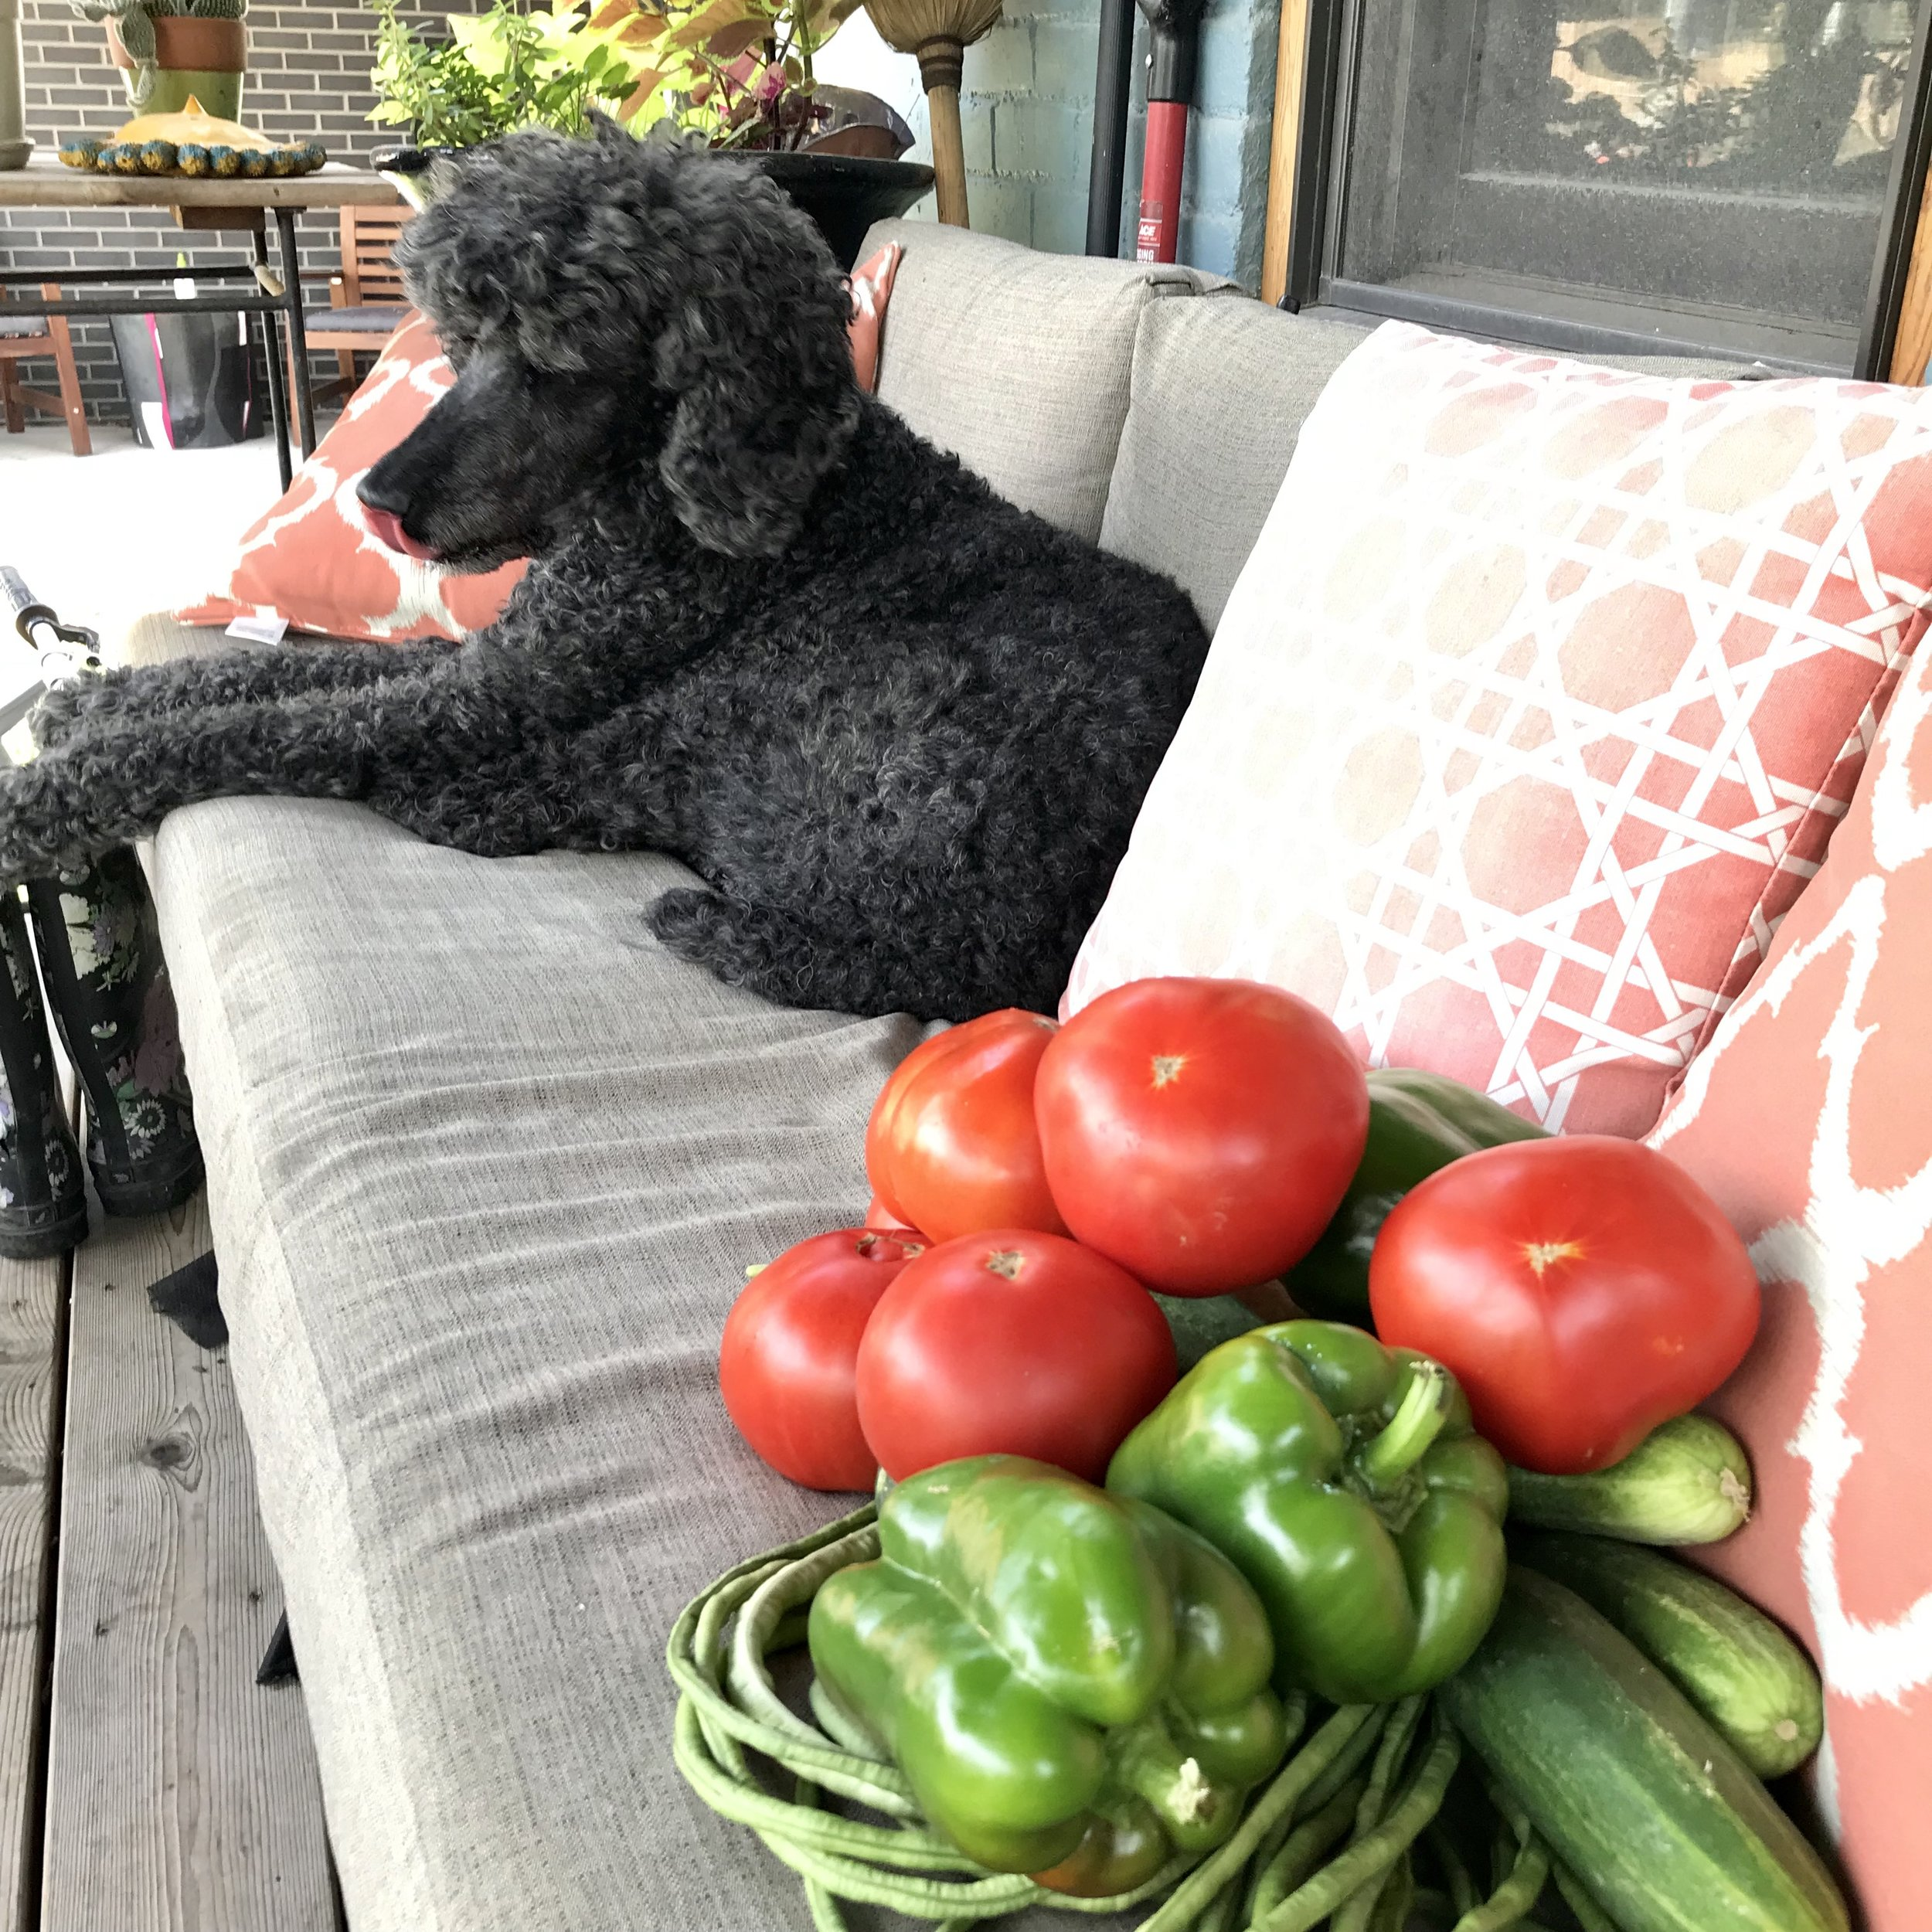 Oscar overseeing the gazpacho ingredients.